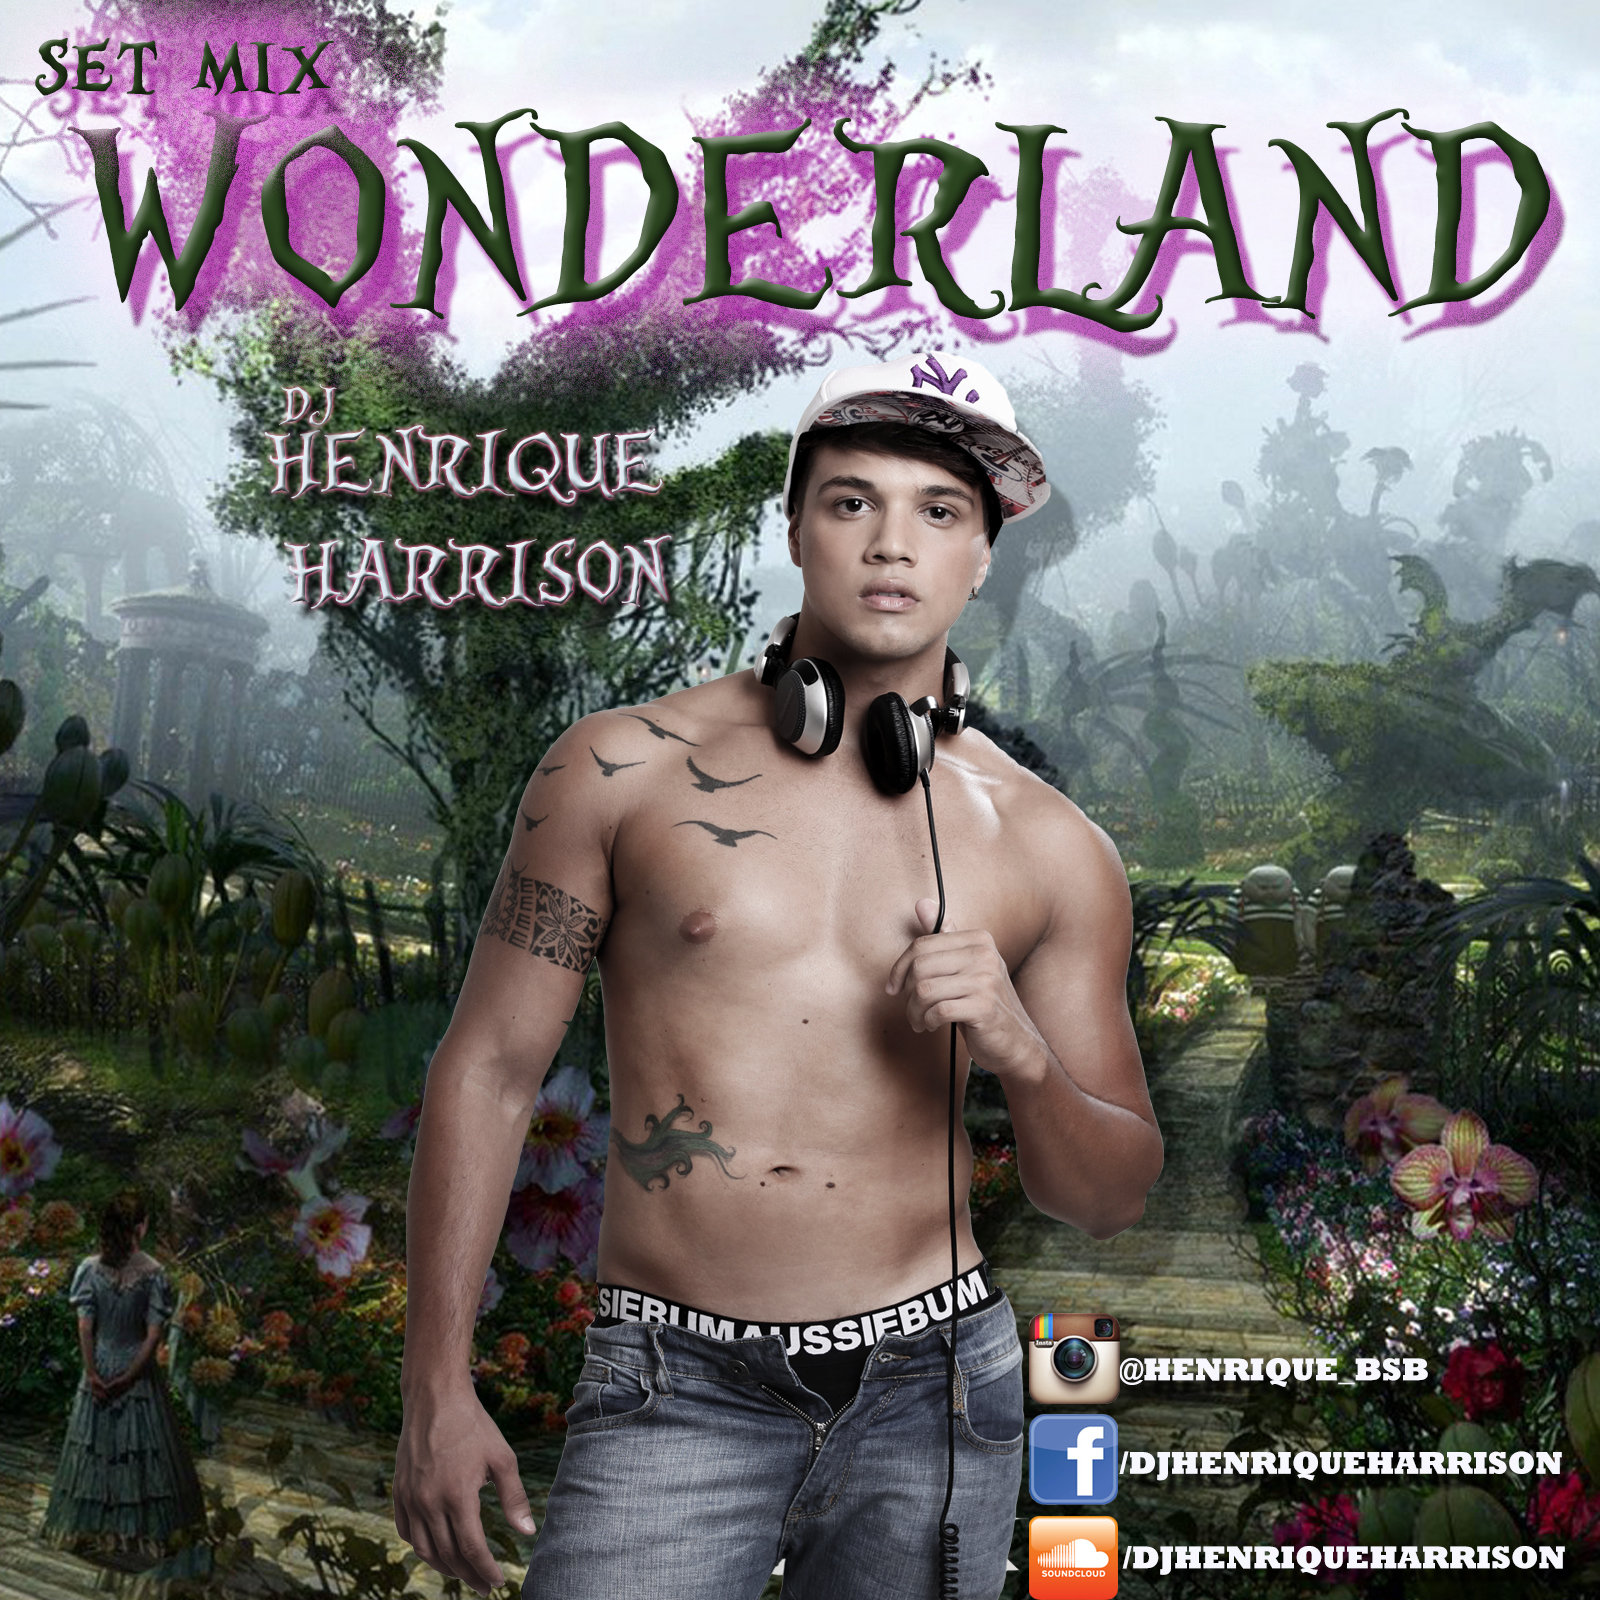 DJ Henrique Harrison - WONDERLAND (Set Mix)